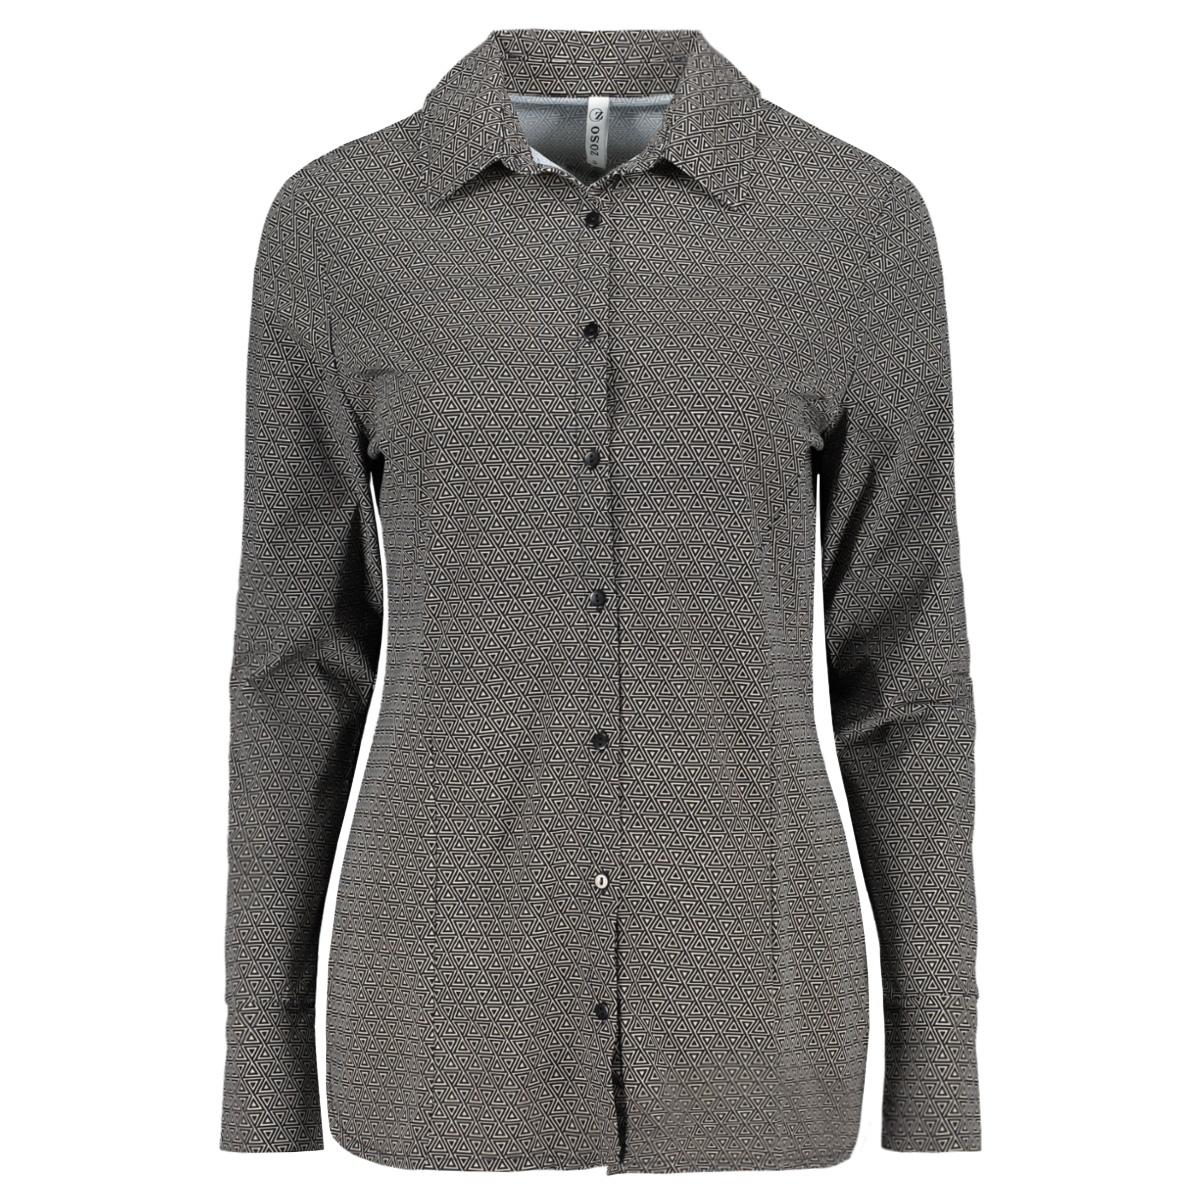 helene printed travel blouse 201 zoso blouse 0000/0021 black/kit